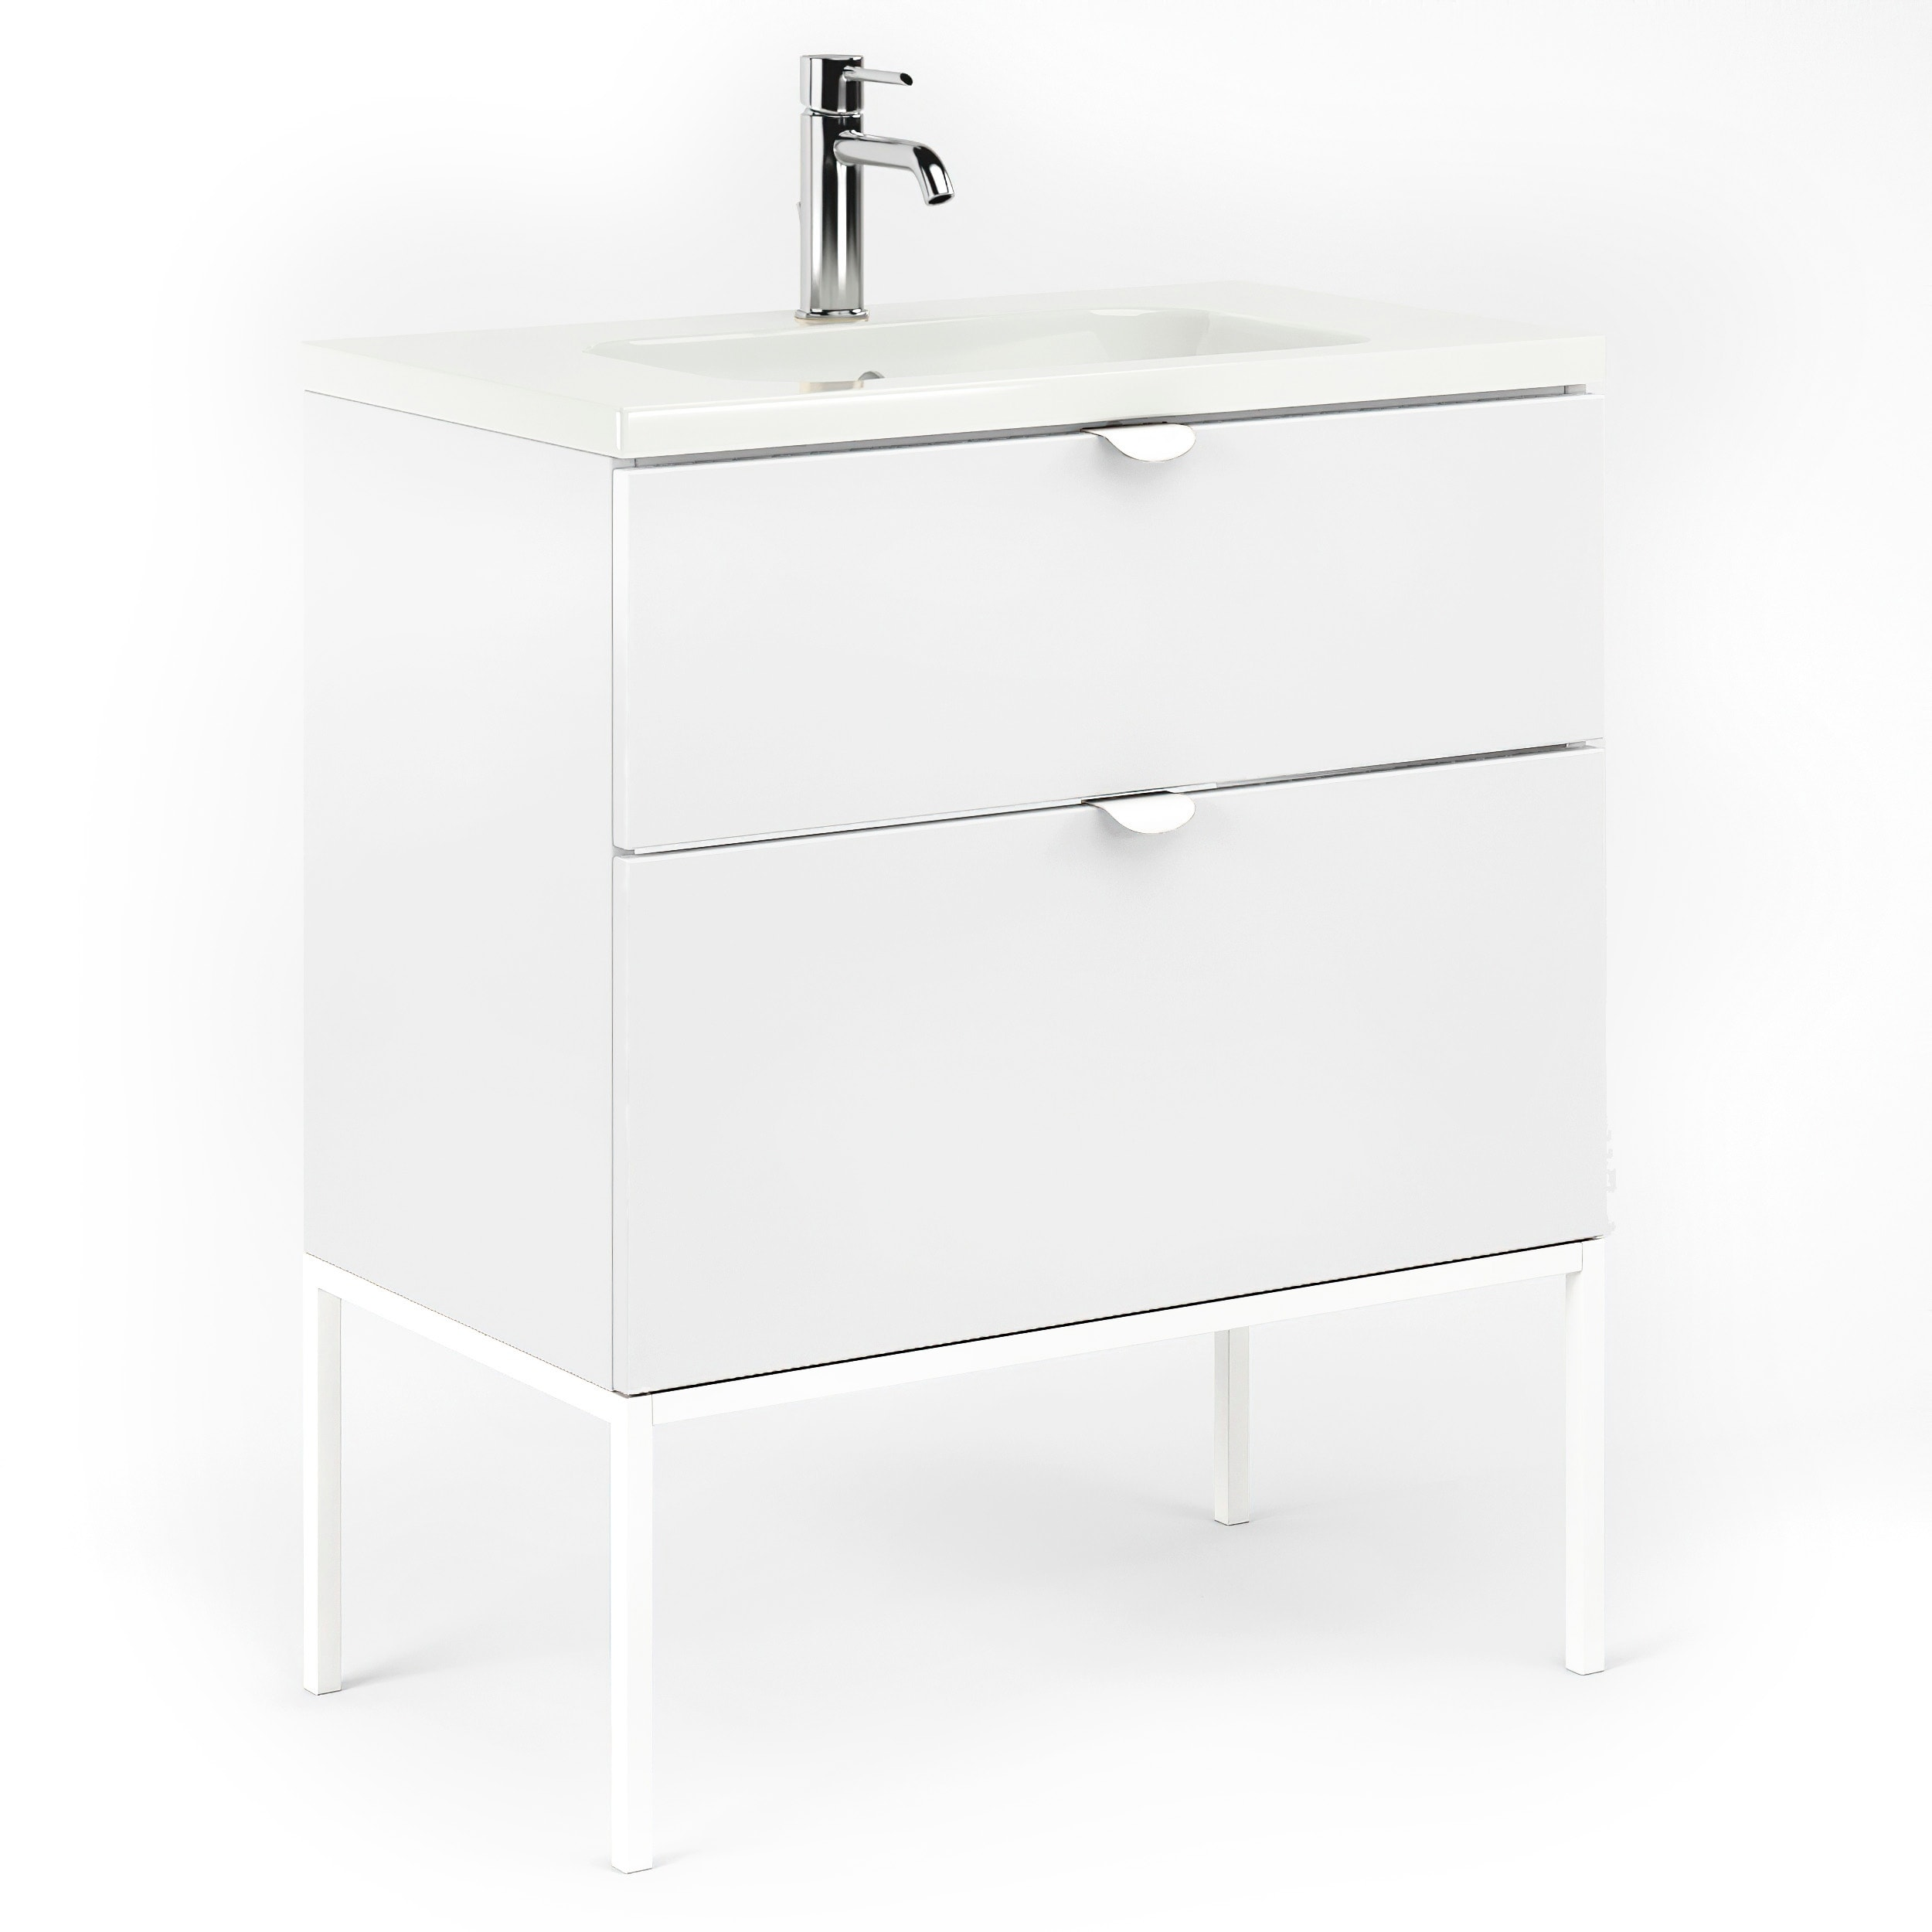 32 Bathroom Vanity Cabinet Ceramic Sink Set Aspen W32 X H35 X D18 In Rhd White Overstock 31519405